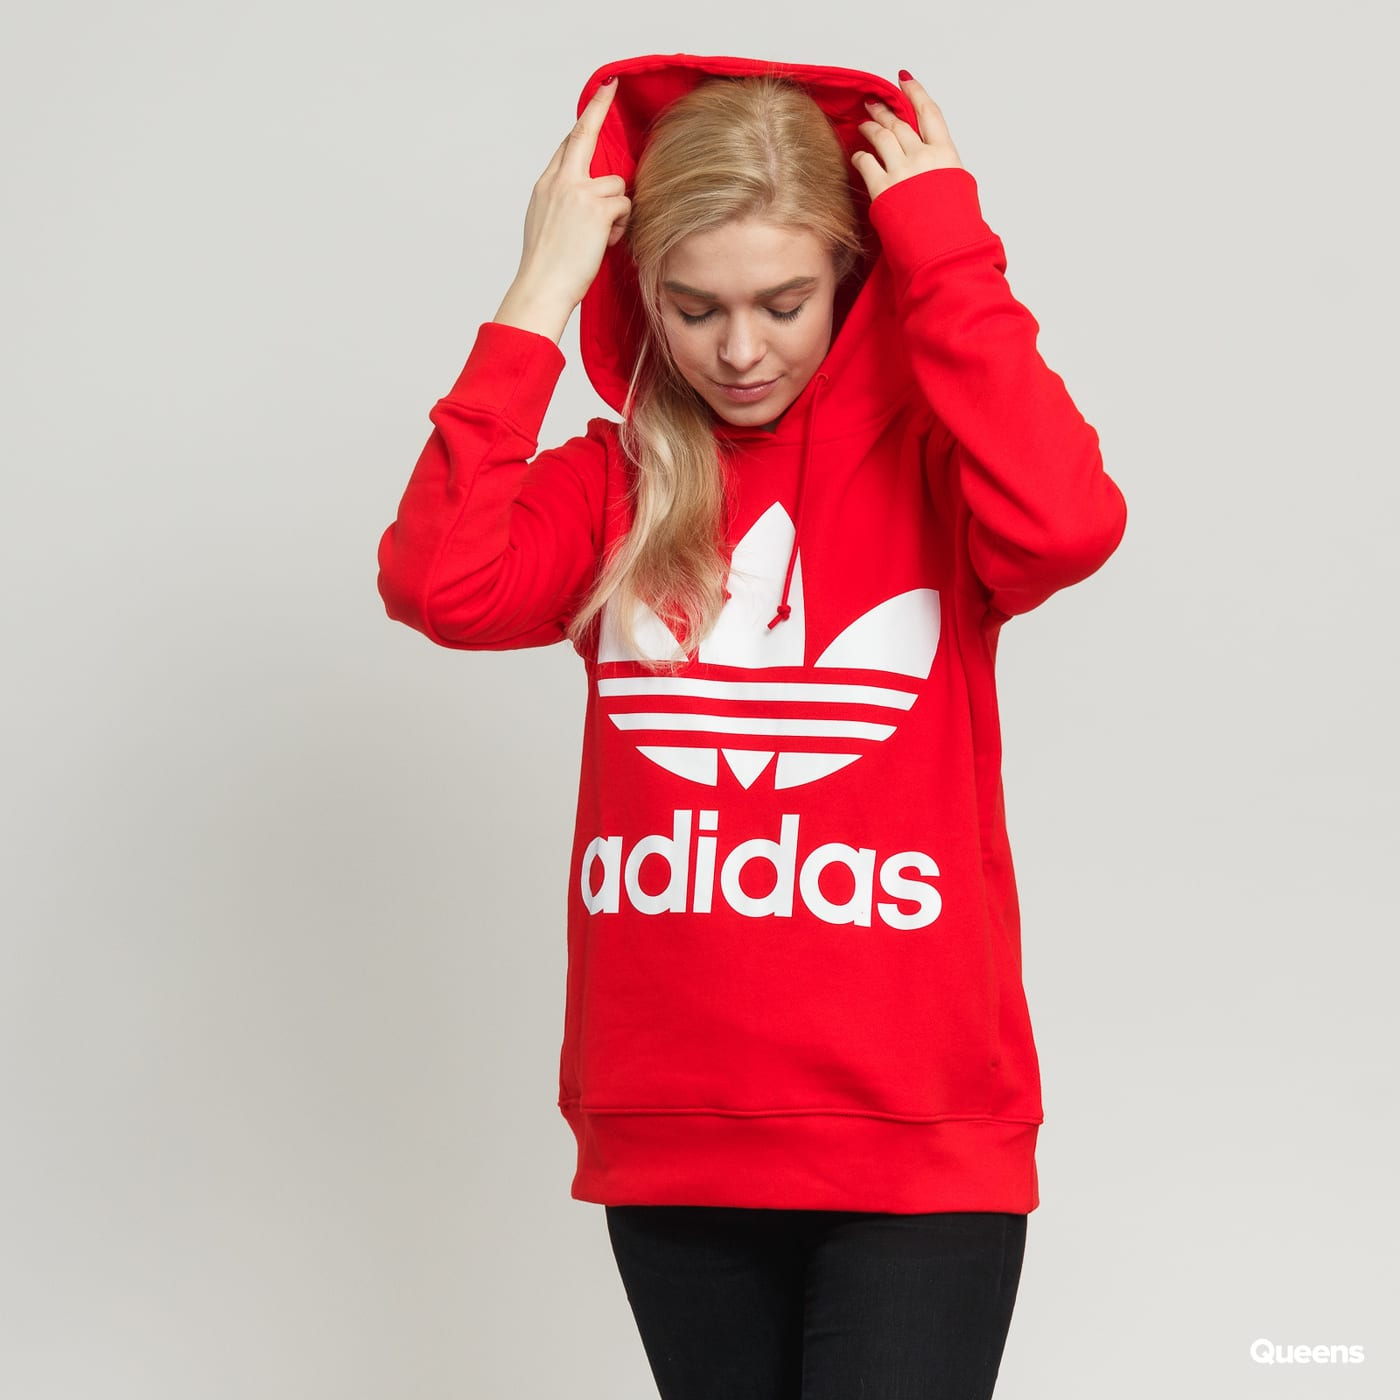 bdcba09aedd Dámská mikina adidas Originals Trefoil Hoodie (FH8563) – Queens 💚